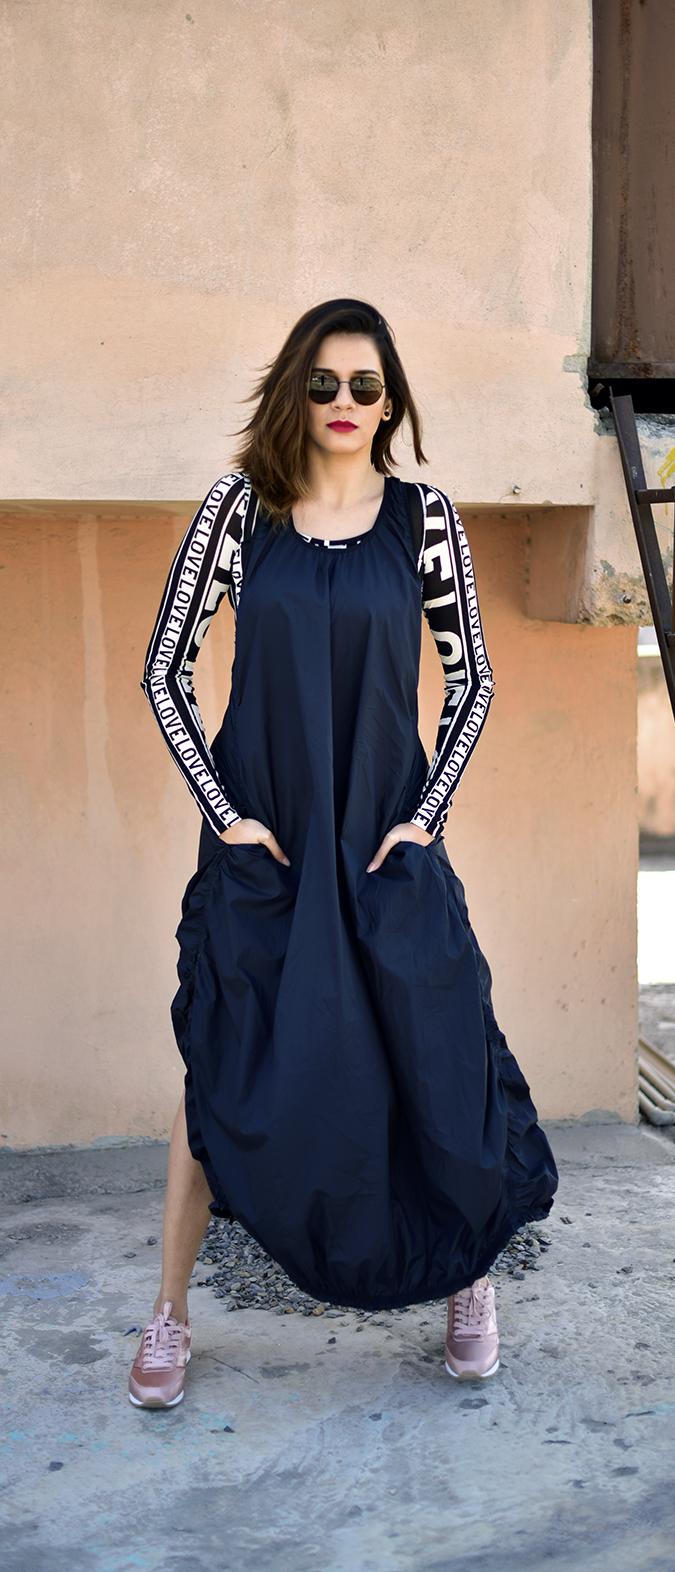 H&M Studio SS17 | Akanksha Redhu | full front legs apart hand in pocket